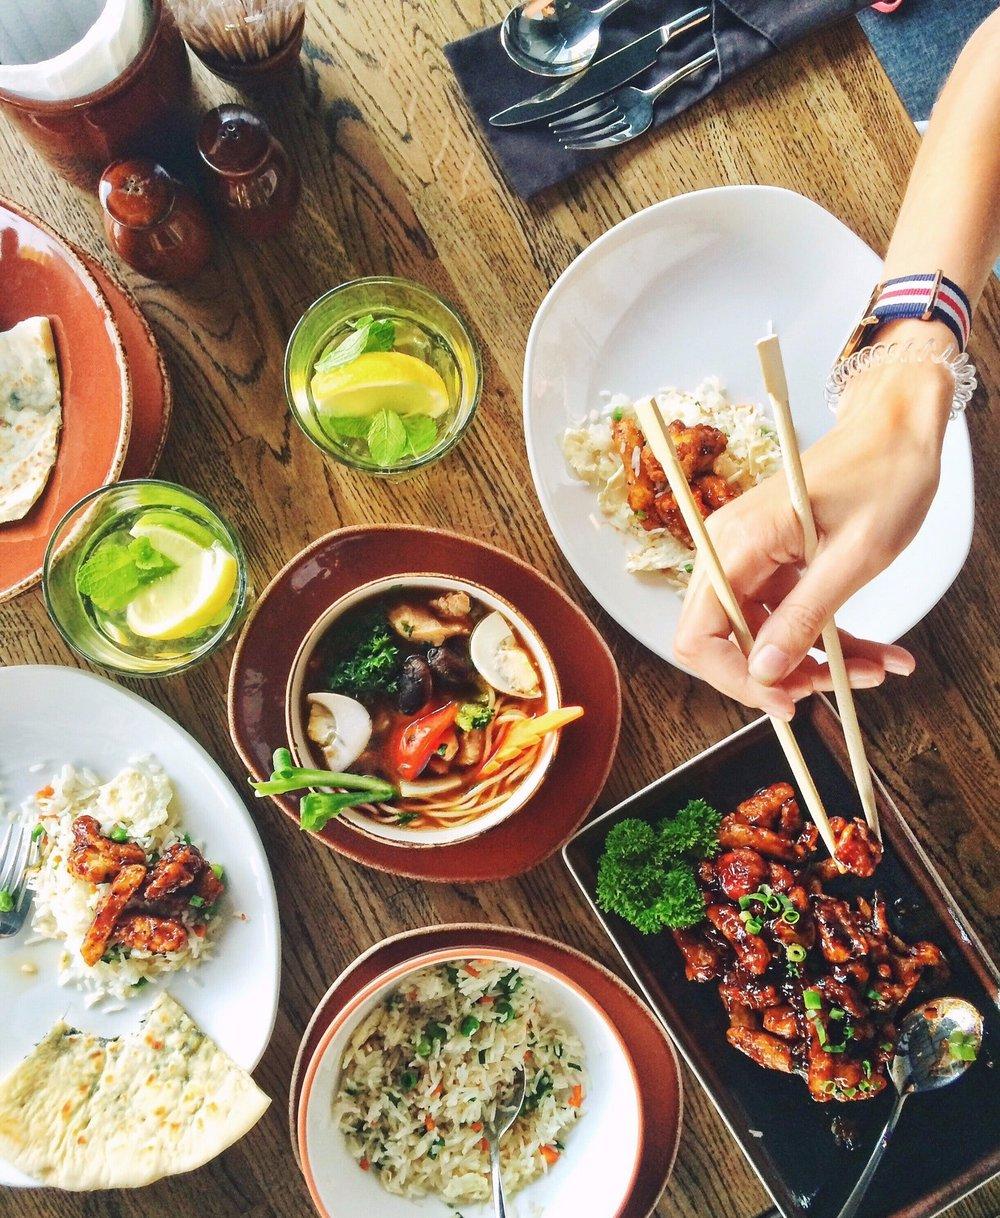 chopsticks-dinner-dish-33162.jpg